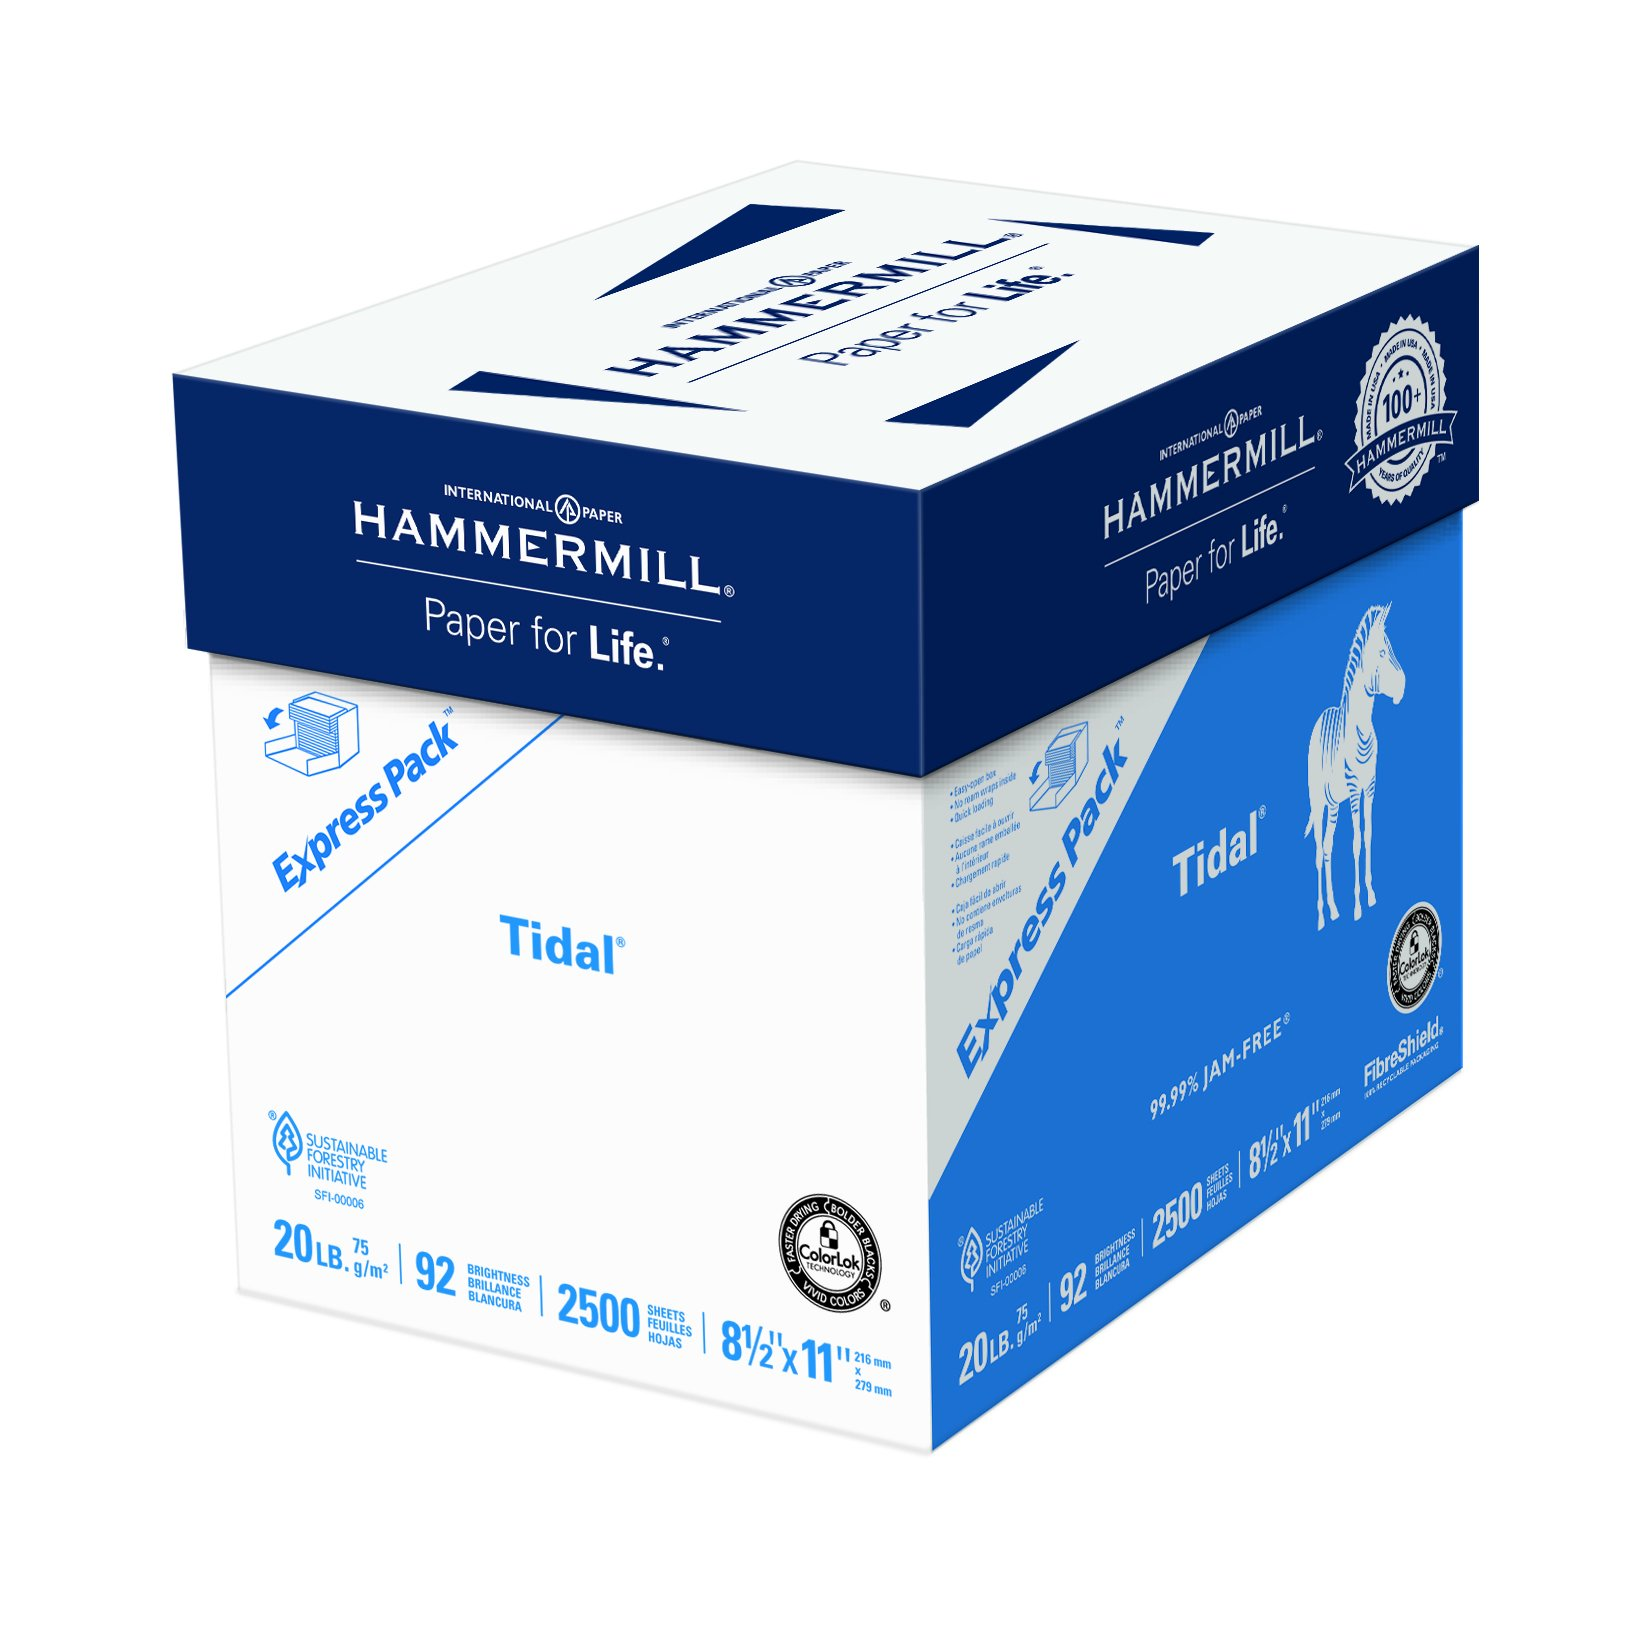 Hammermill Paper, Tidal Copy Paper, 8.5 x 11 Paper, Letter Size, 20lb Paper, 92 Bright, Express Pack / 2,500 Sheets NO REAM WRAP (163120C) Acid Free Paper